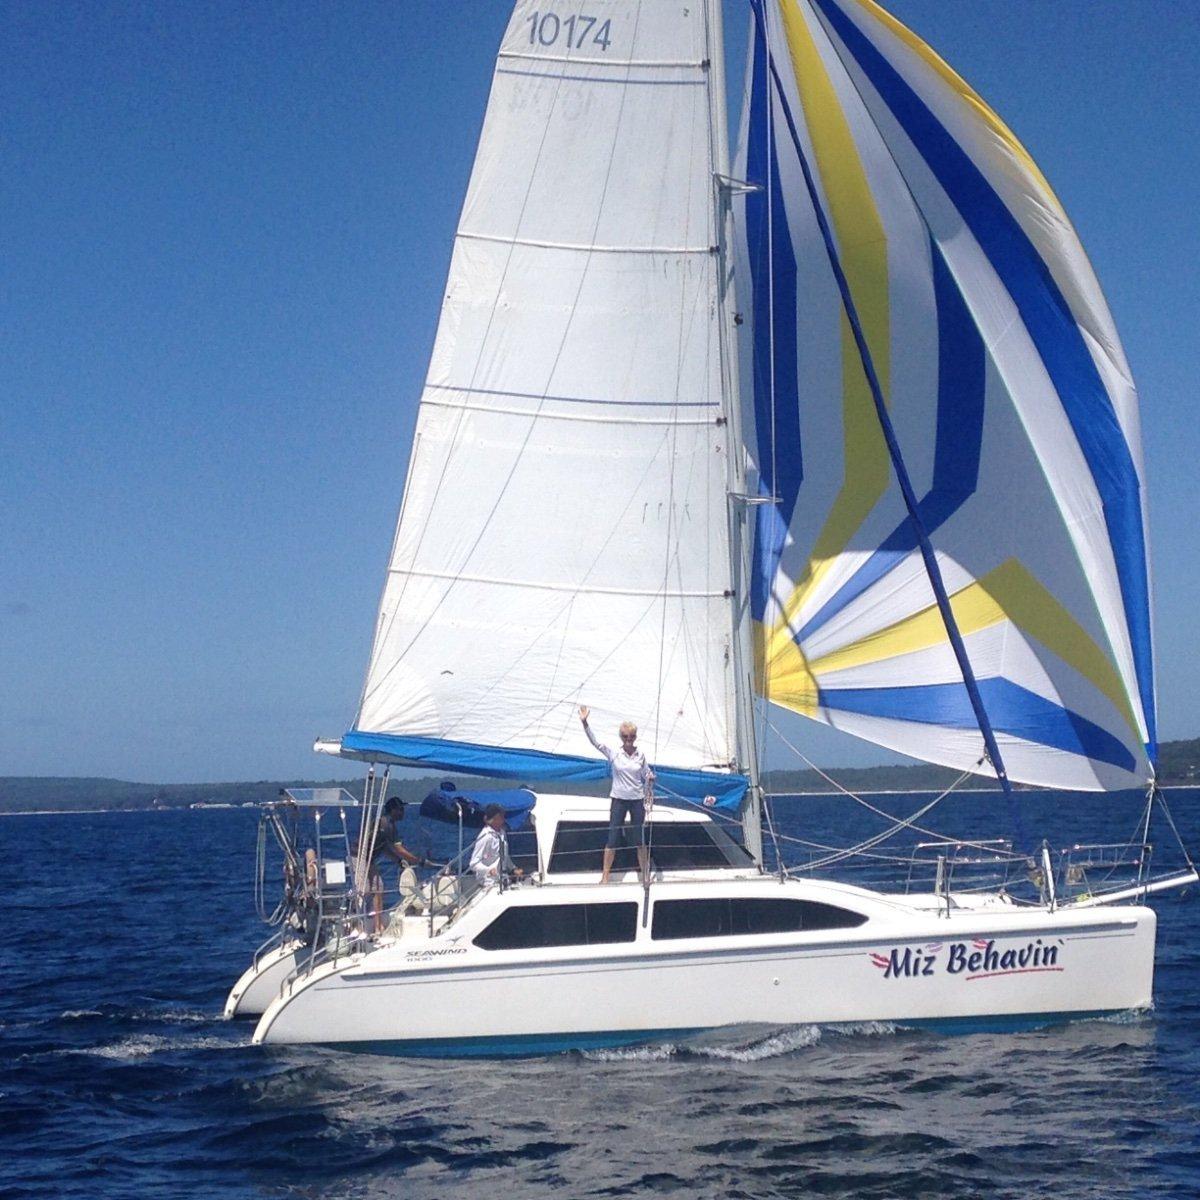 Seawind 1000 Sail Number SW10174